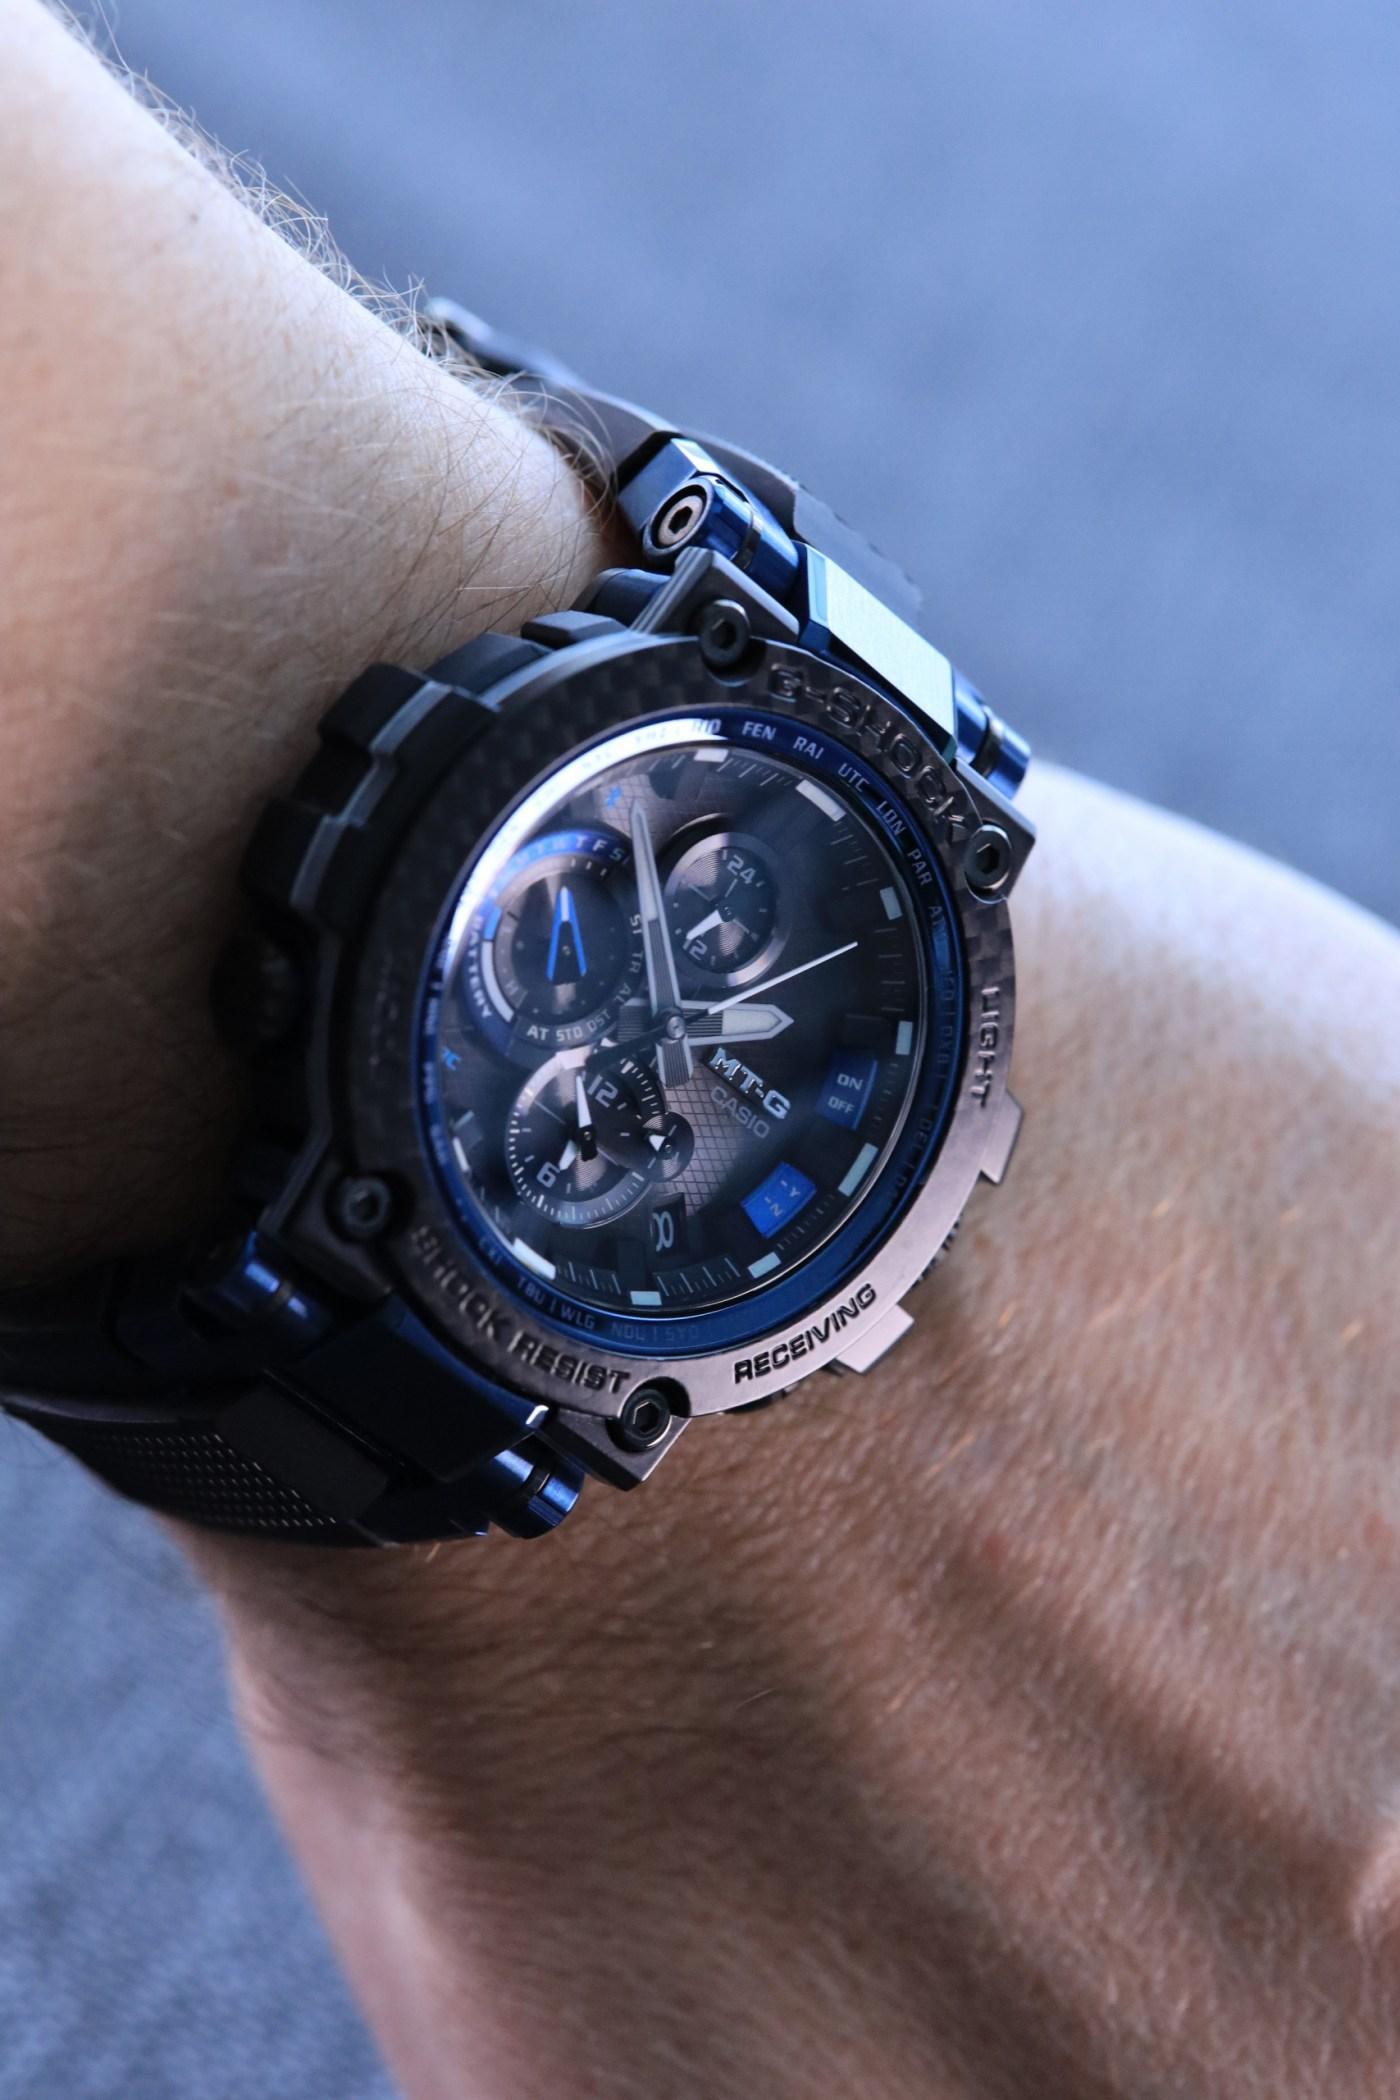 G-Shock MT-G Carbon Fiber MTGB1000XB-1A close-up wristshot